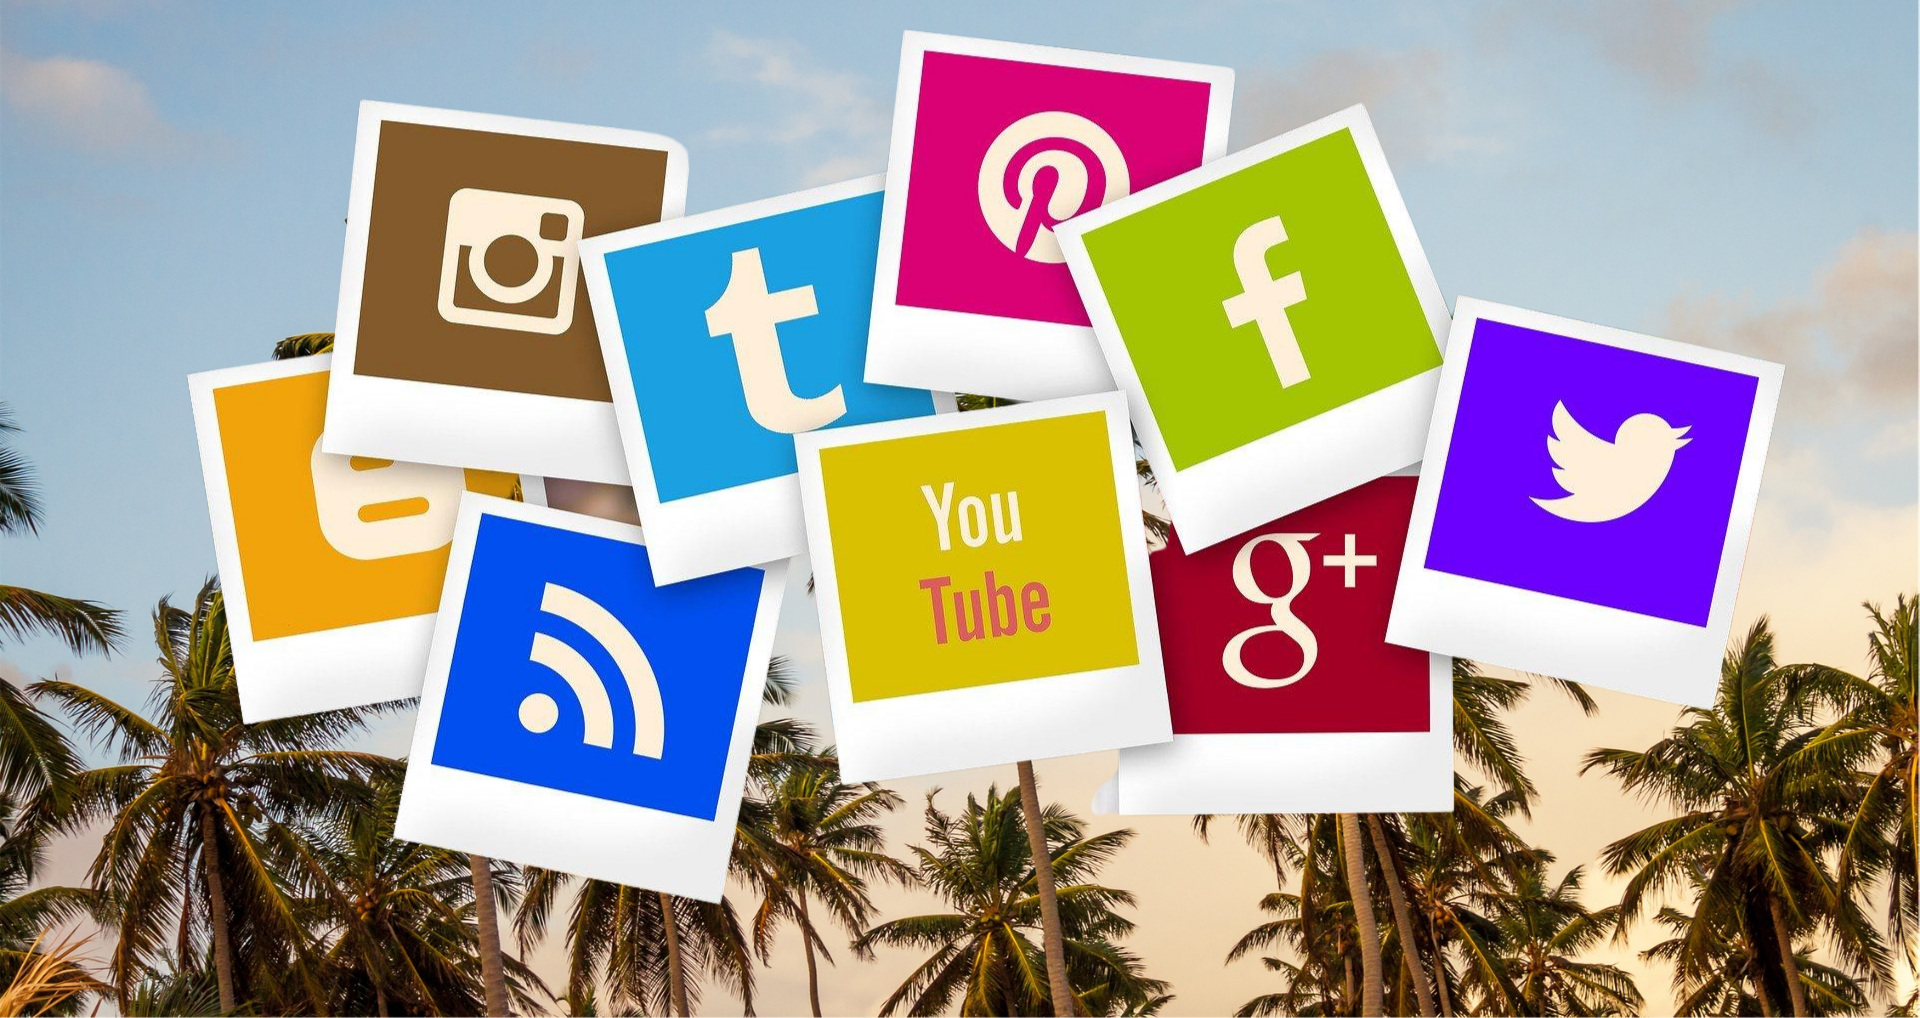 How to Pick the Best Social Media Platform for Your Virgin Islands Business